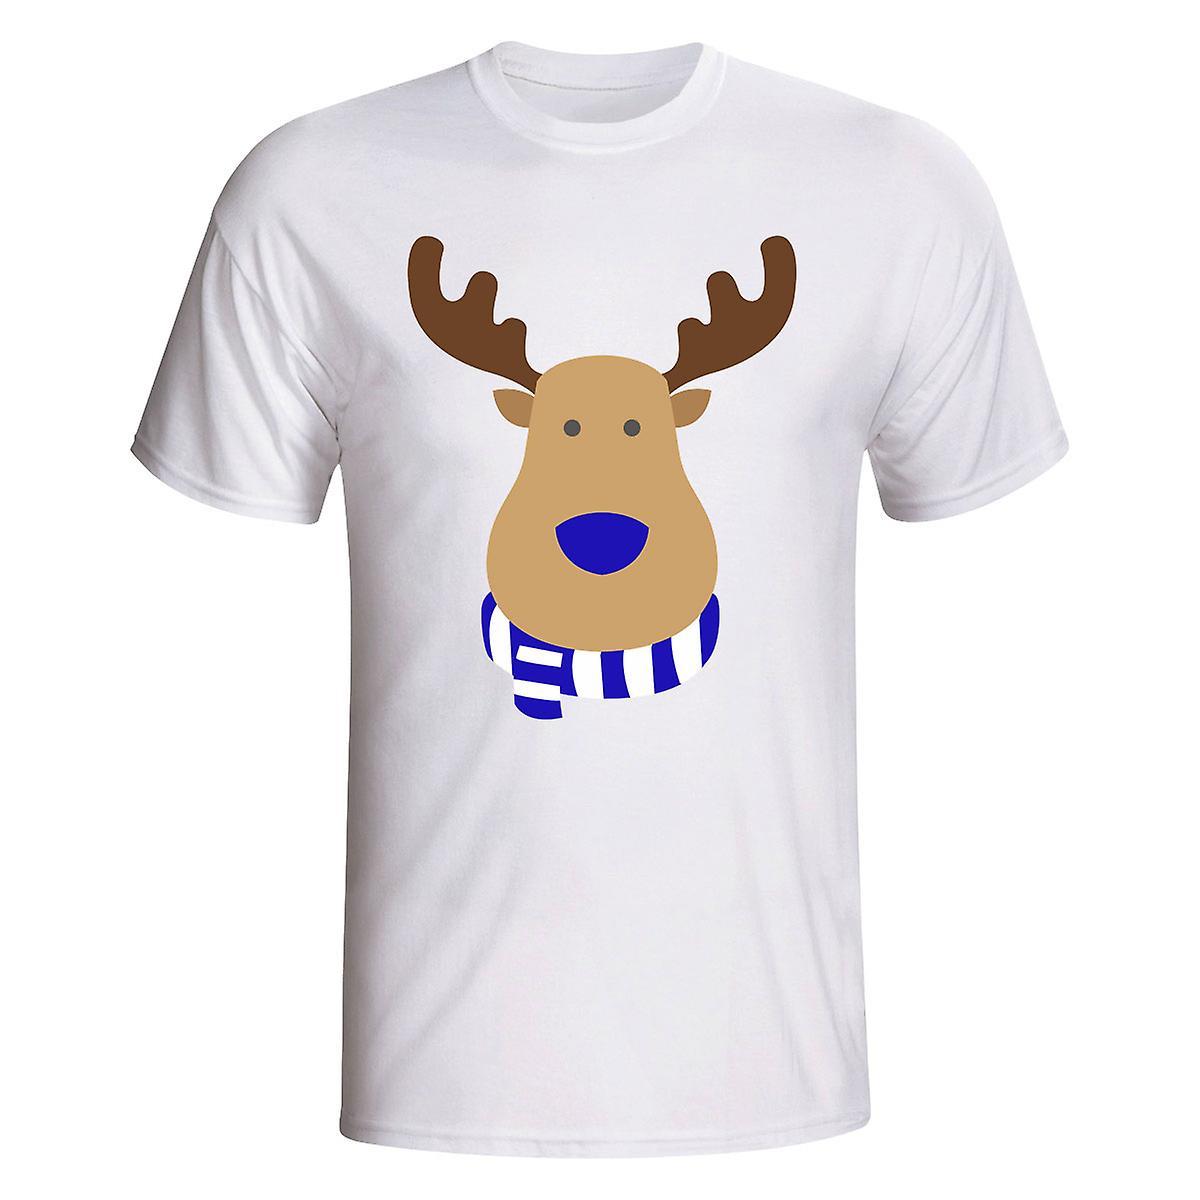 Hamburg Rudolph Supporters T-shirt (white)